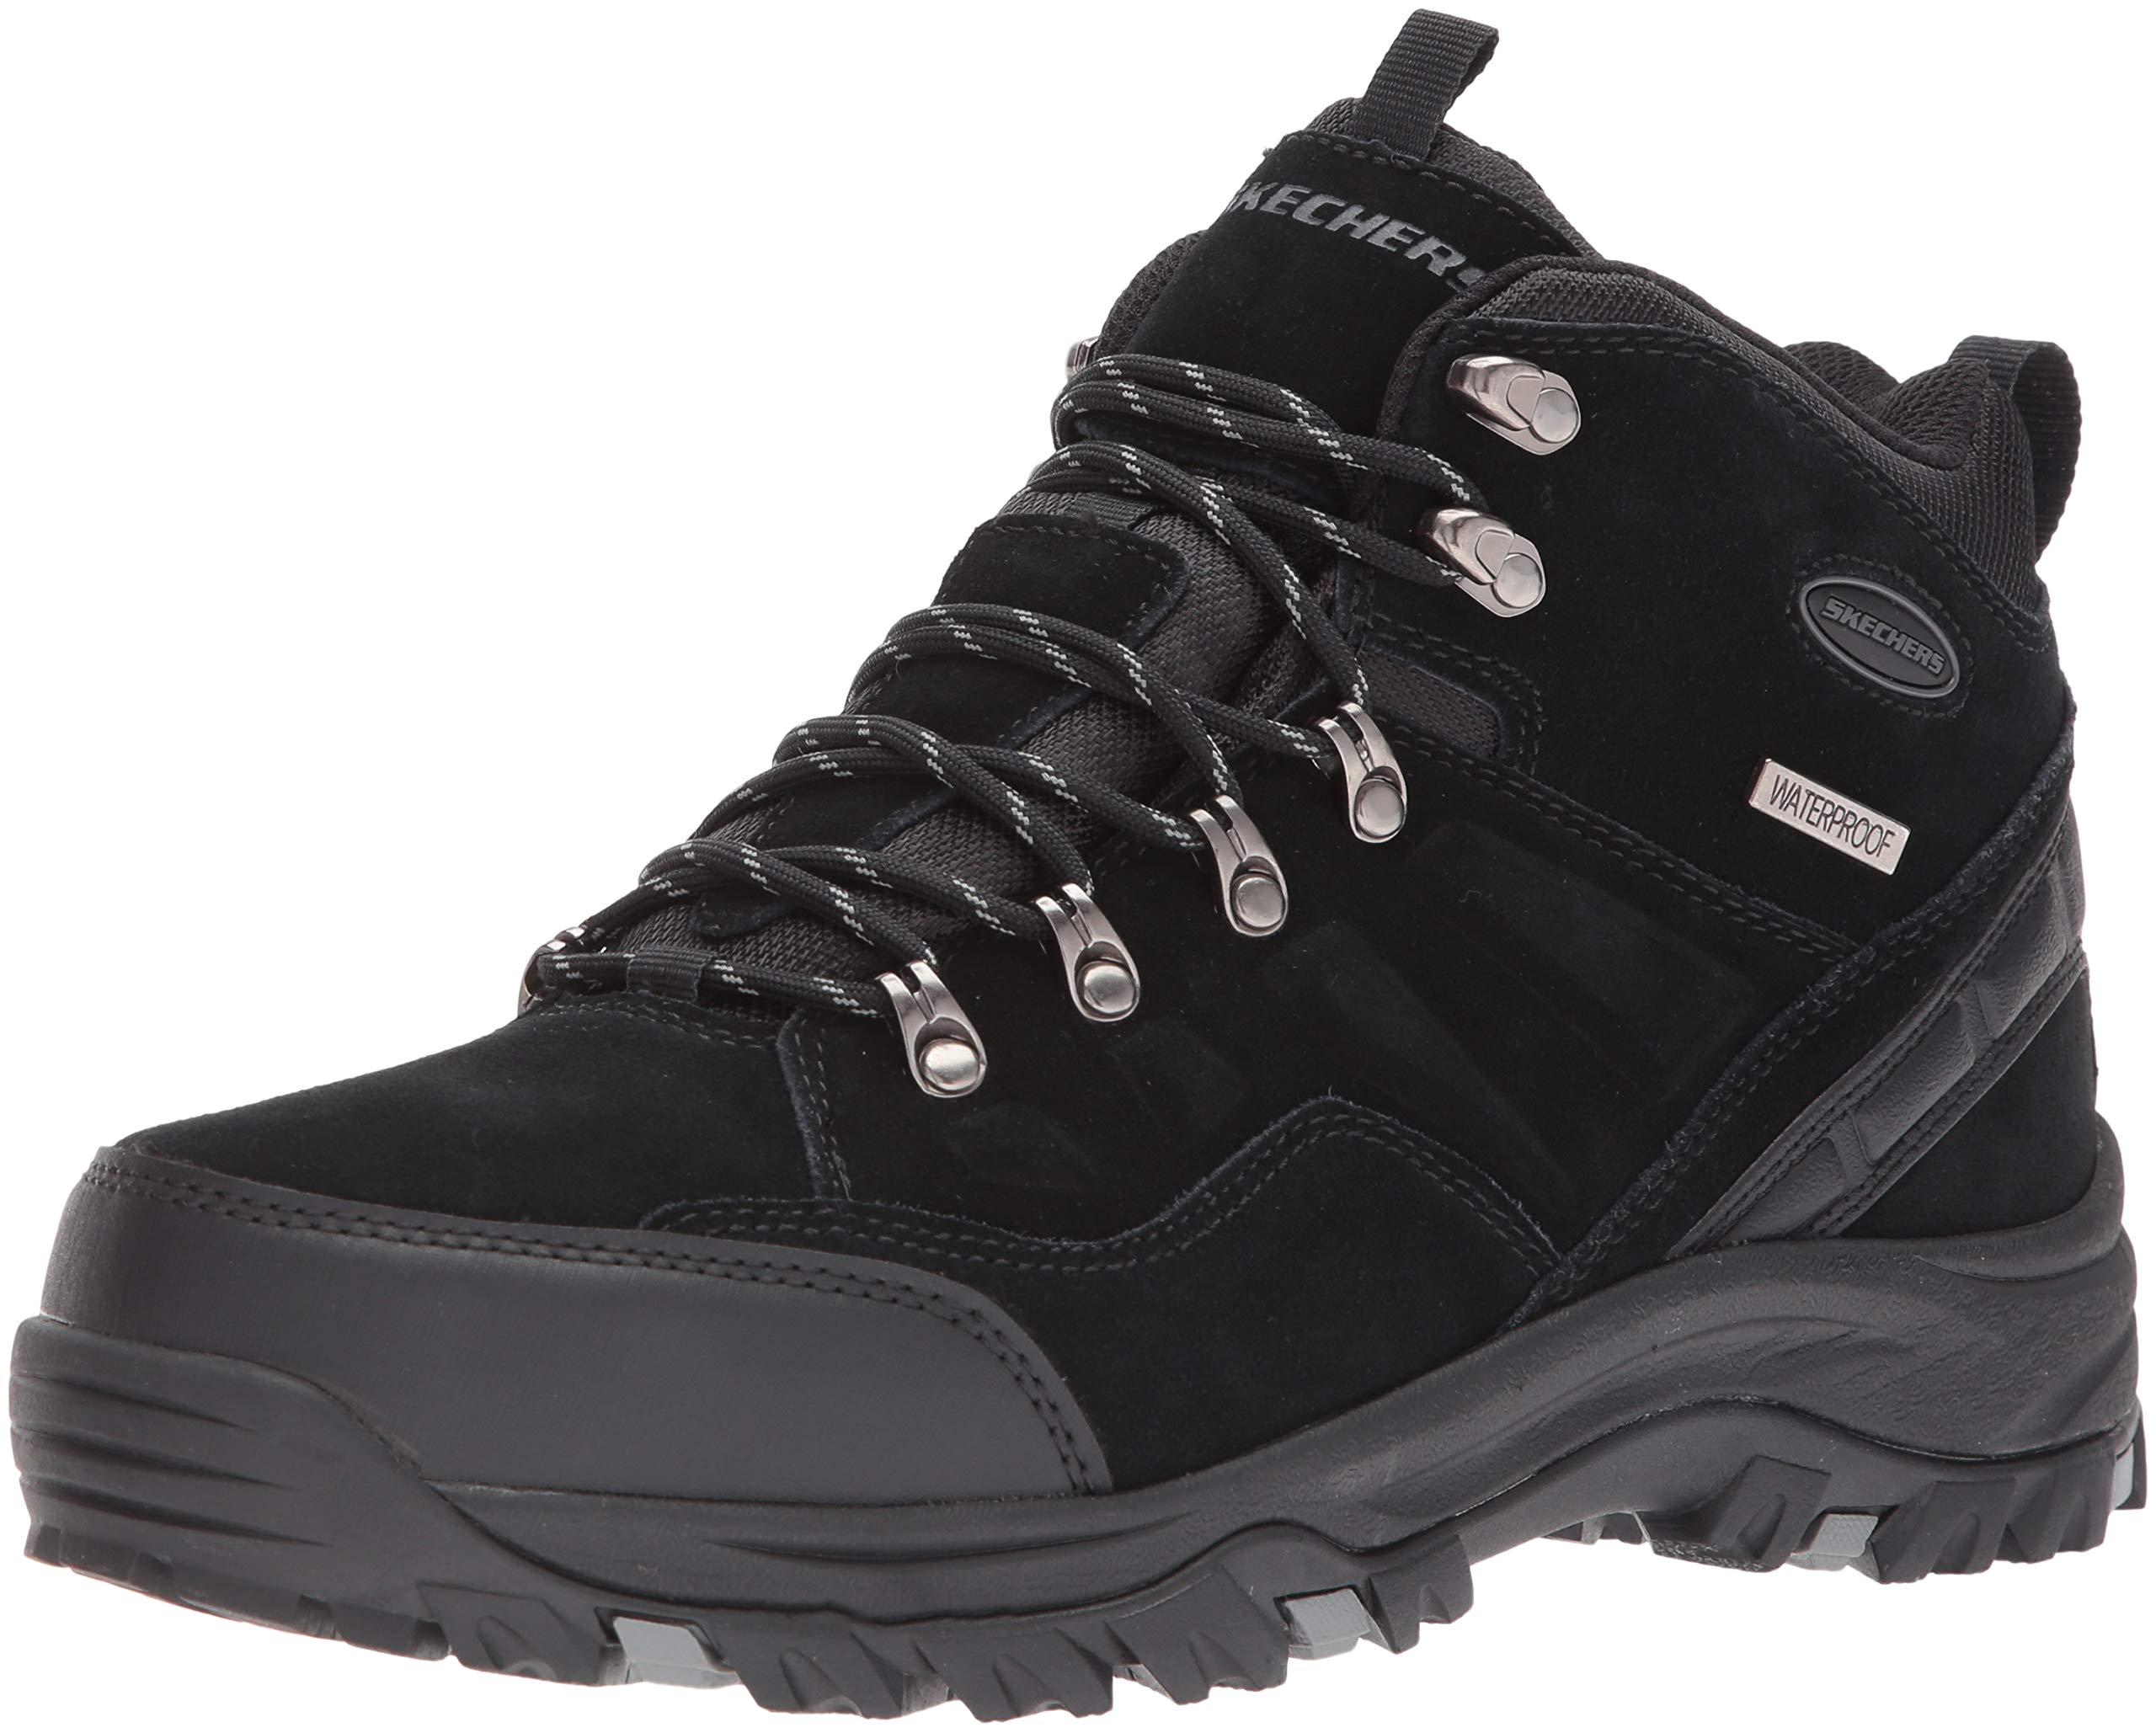 Skechers Men's RELMENT-PELMO Hiking Boot, Black, 12 Medium US